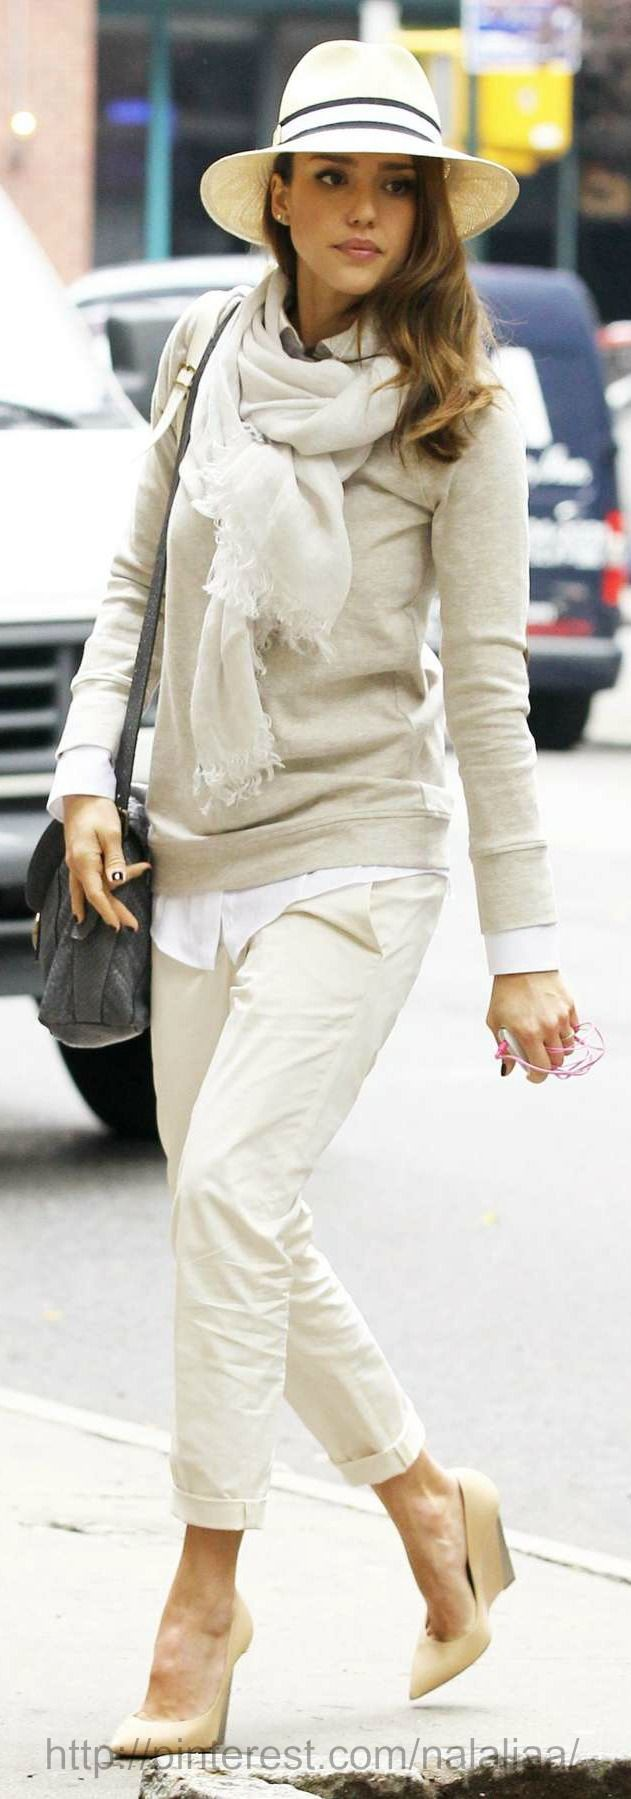 Head to toe cream will streamline yr look & looks super sophisticated! #austin #style